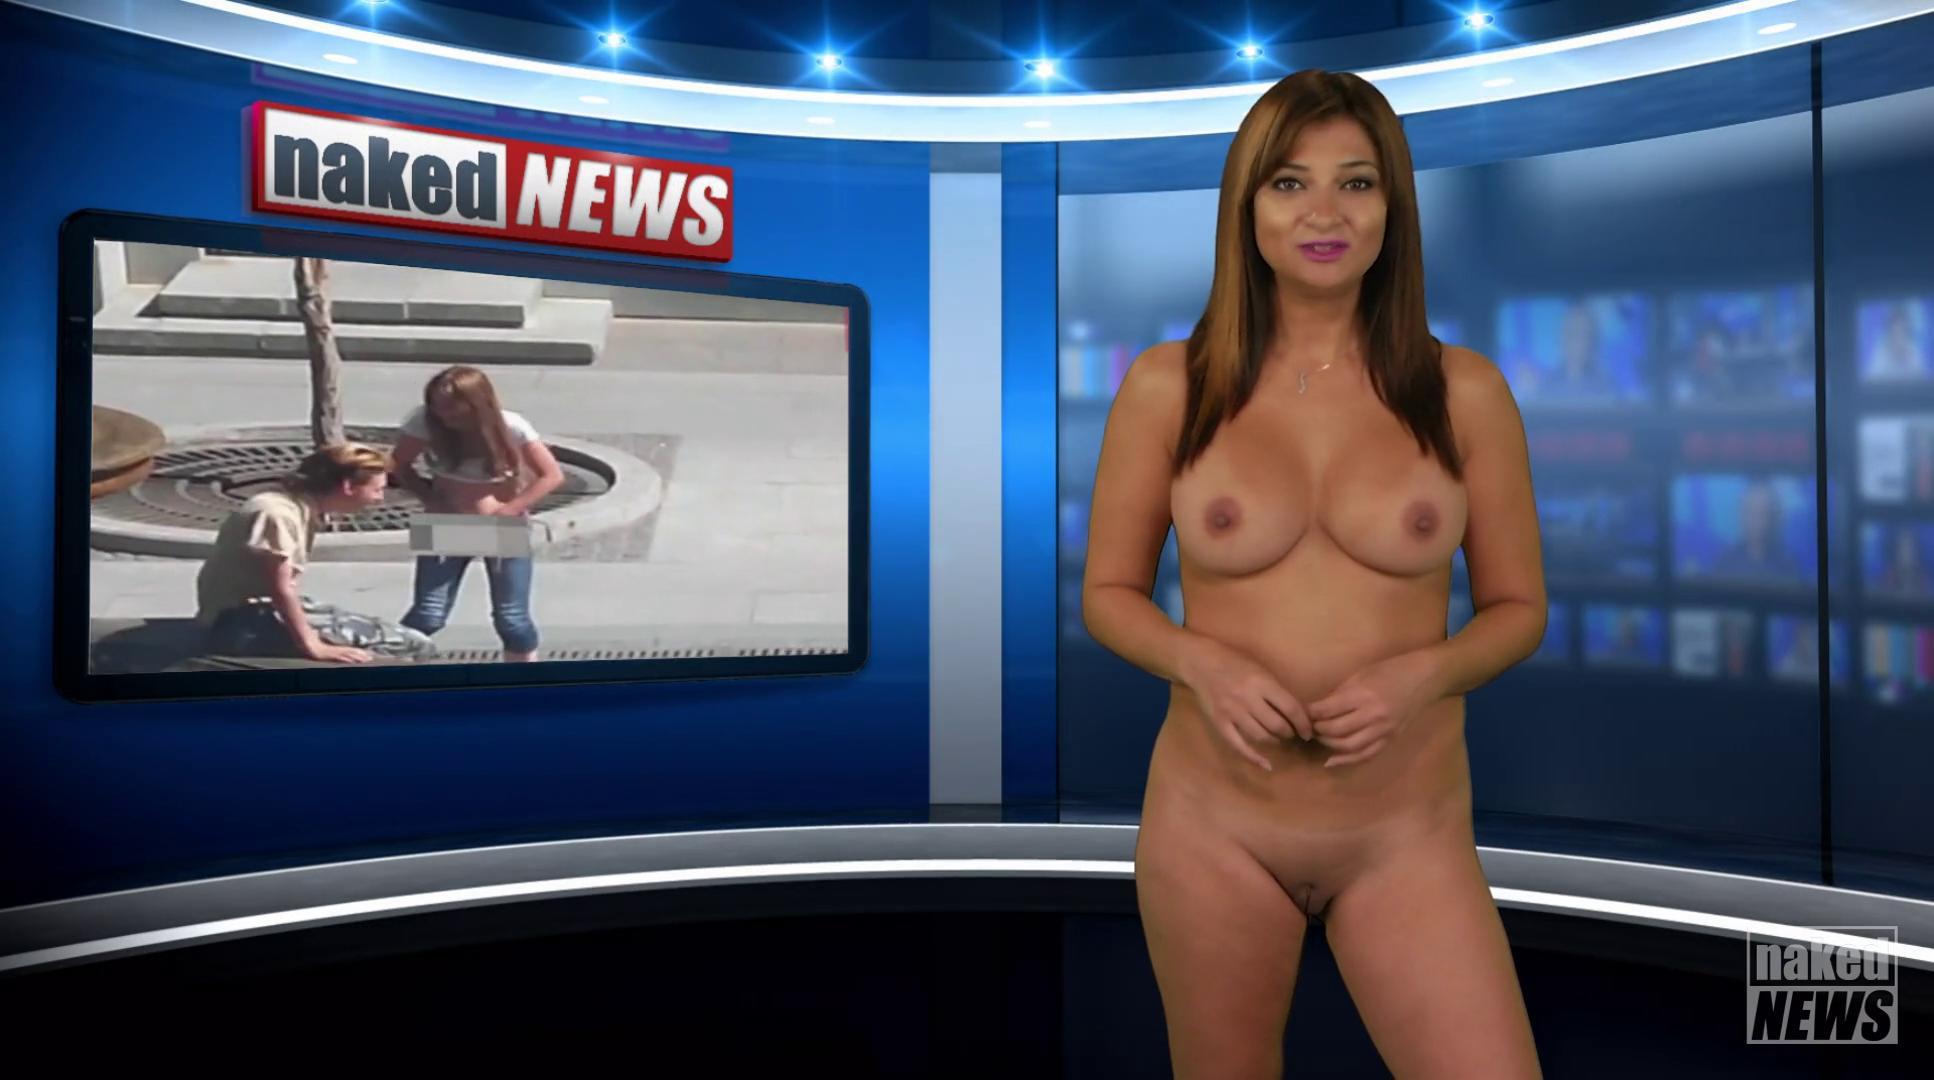 Holly weston naked news